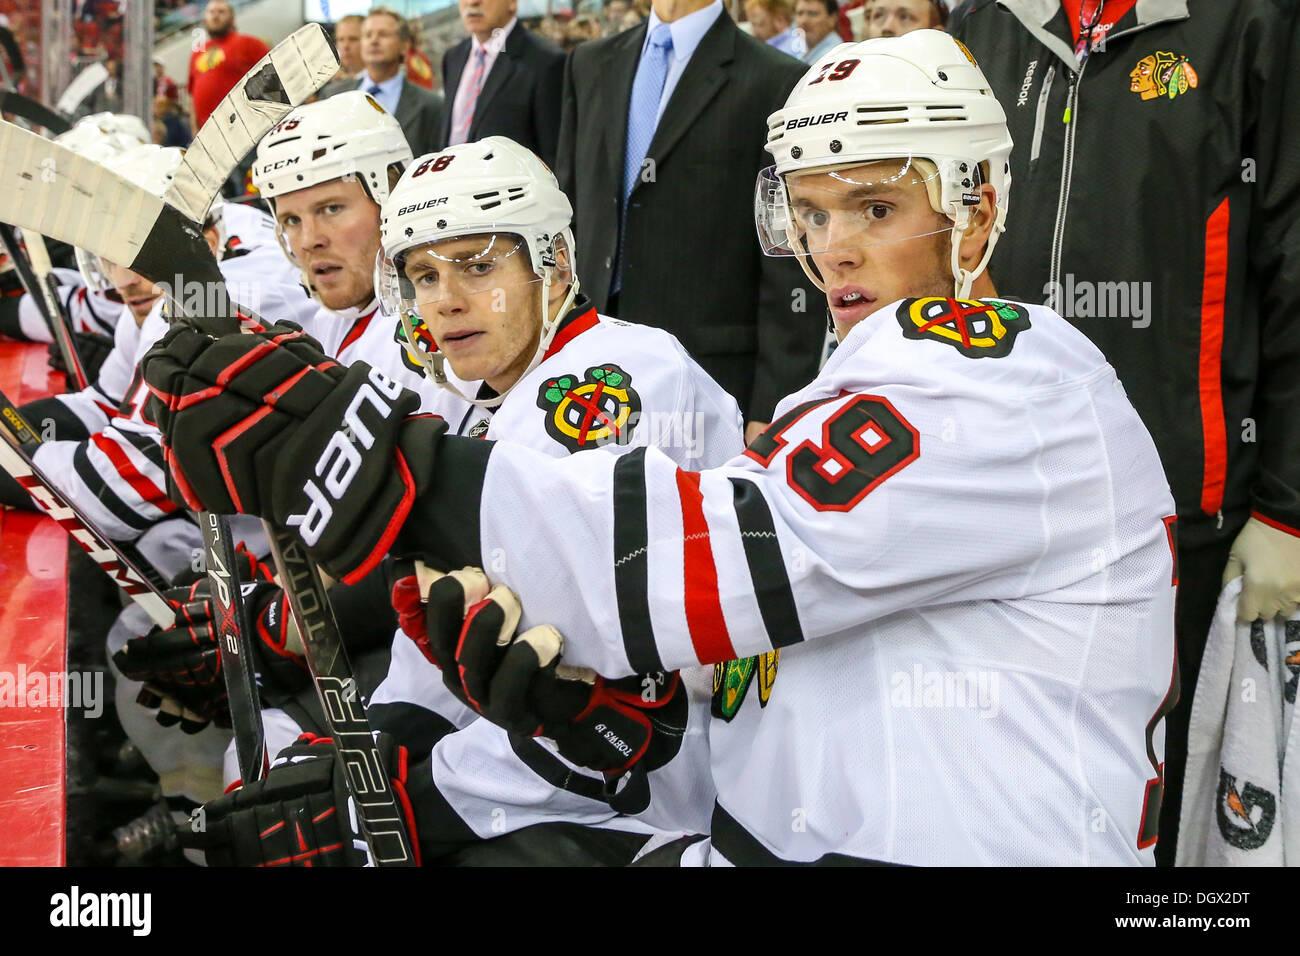 Chicago Blackhawk Jonathan Toews, Patrick Kane, Bryan Bickell during an NHL hockey game during the 2013-2014 season - Stock Image